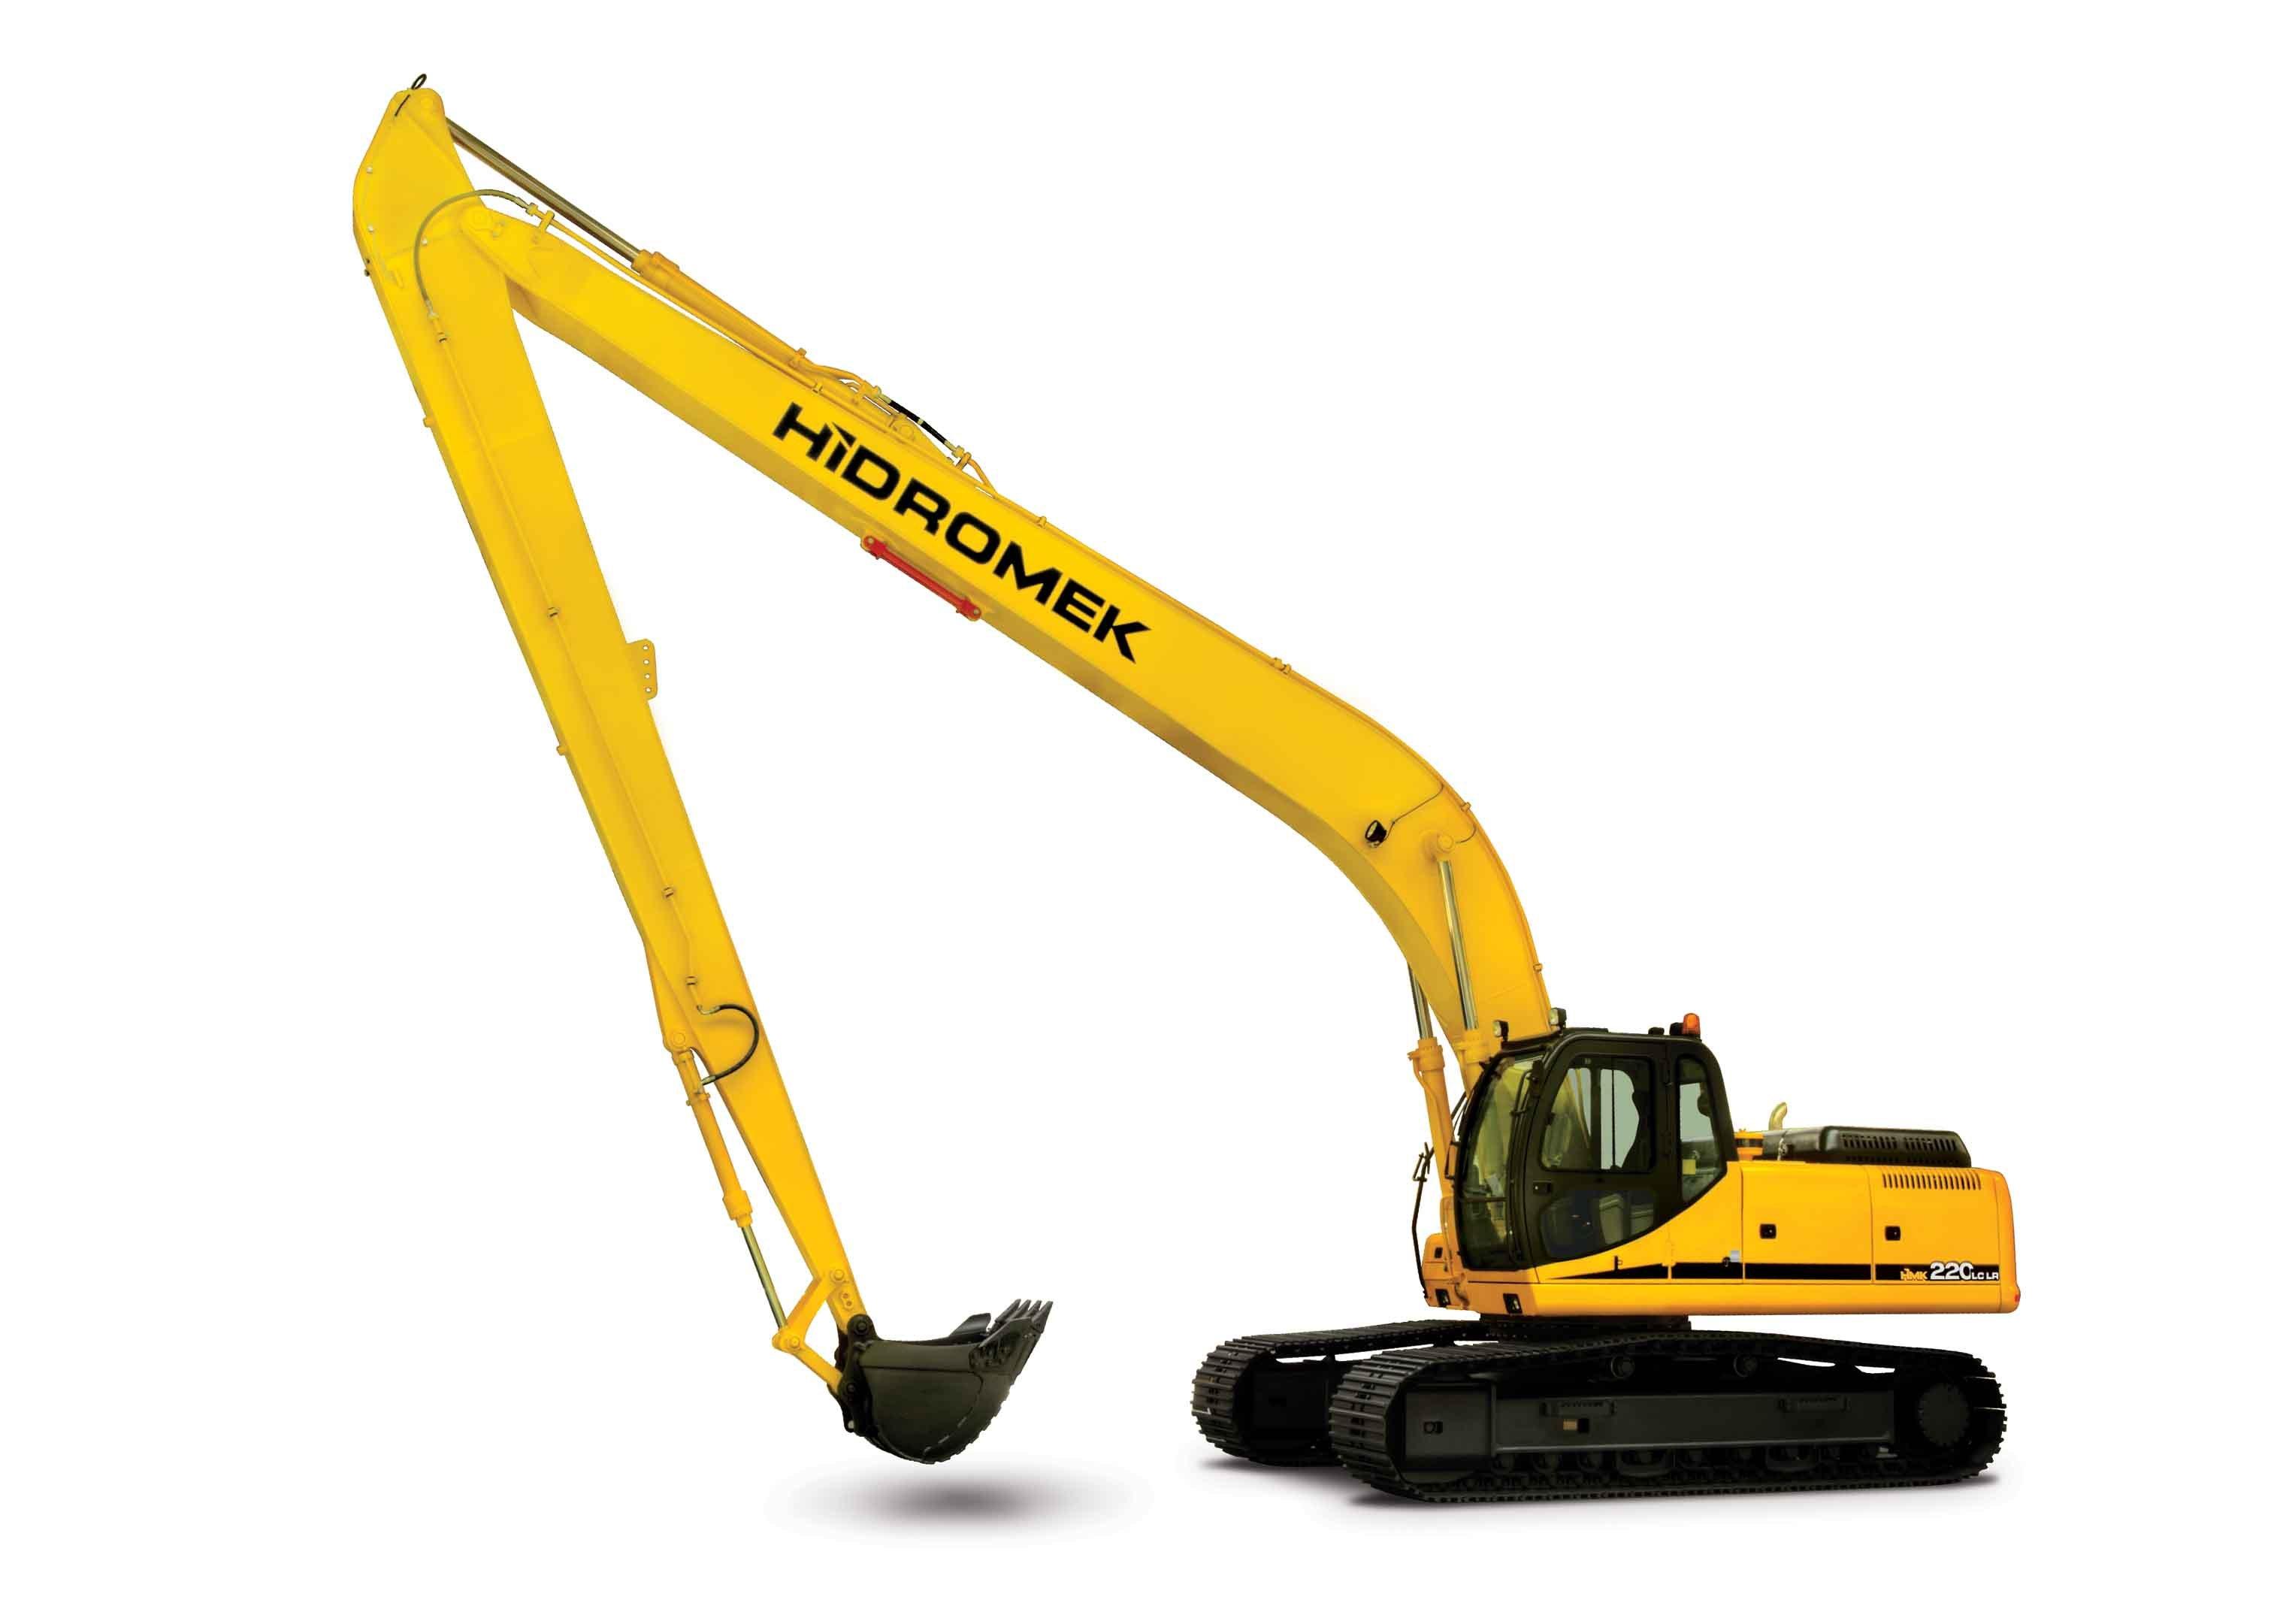 24_tons_Long_reach_type_Crawler_excavator